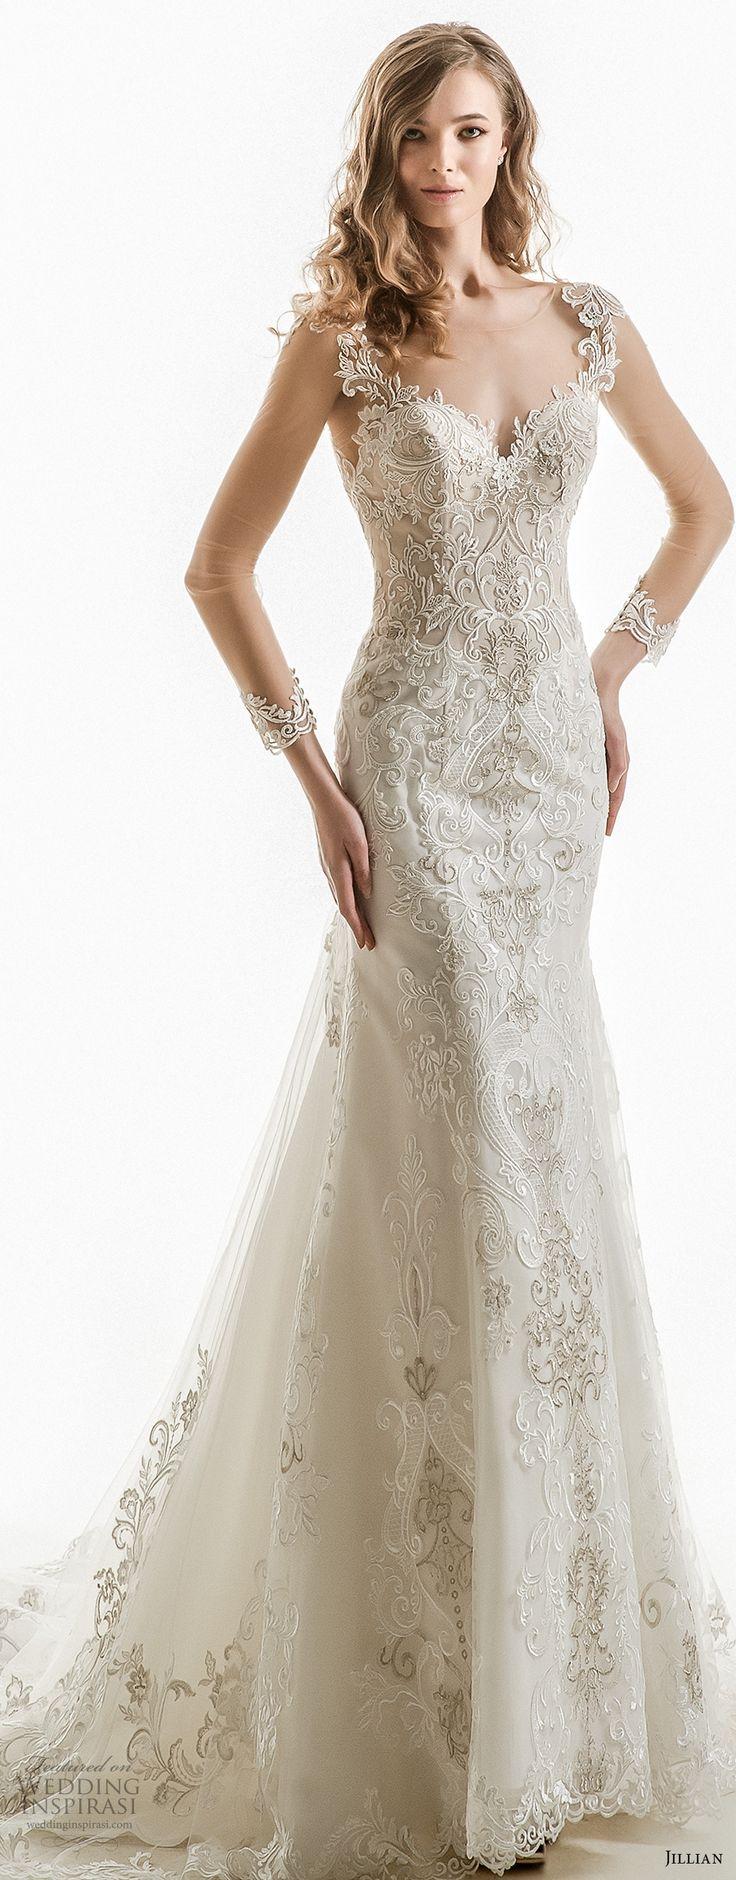 jillian 2018 bridal cap sleeves sweetheart neckline heavily embellished bodice elegant sheath wedding dress open v back chapel train (03) mv